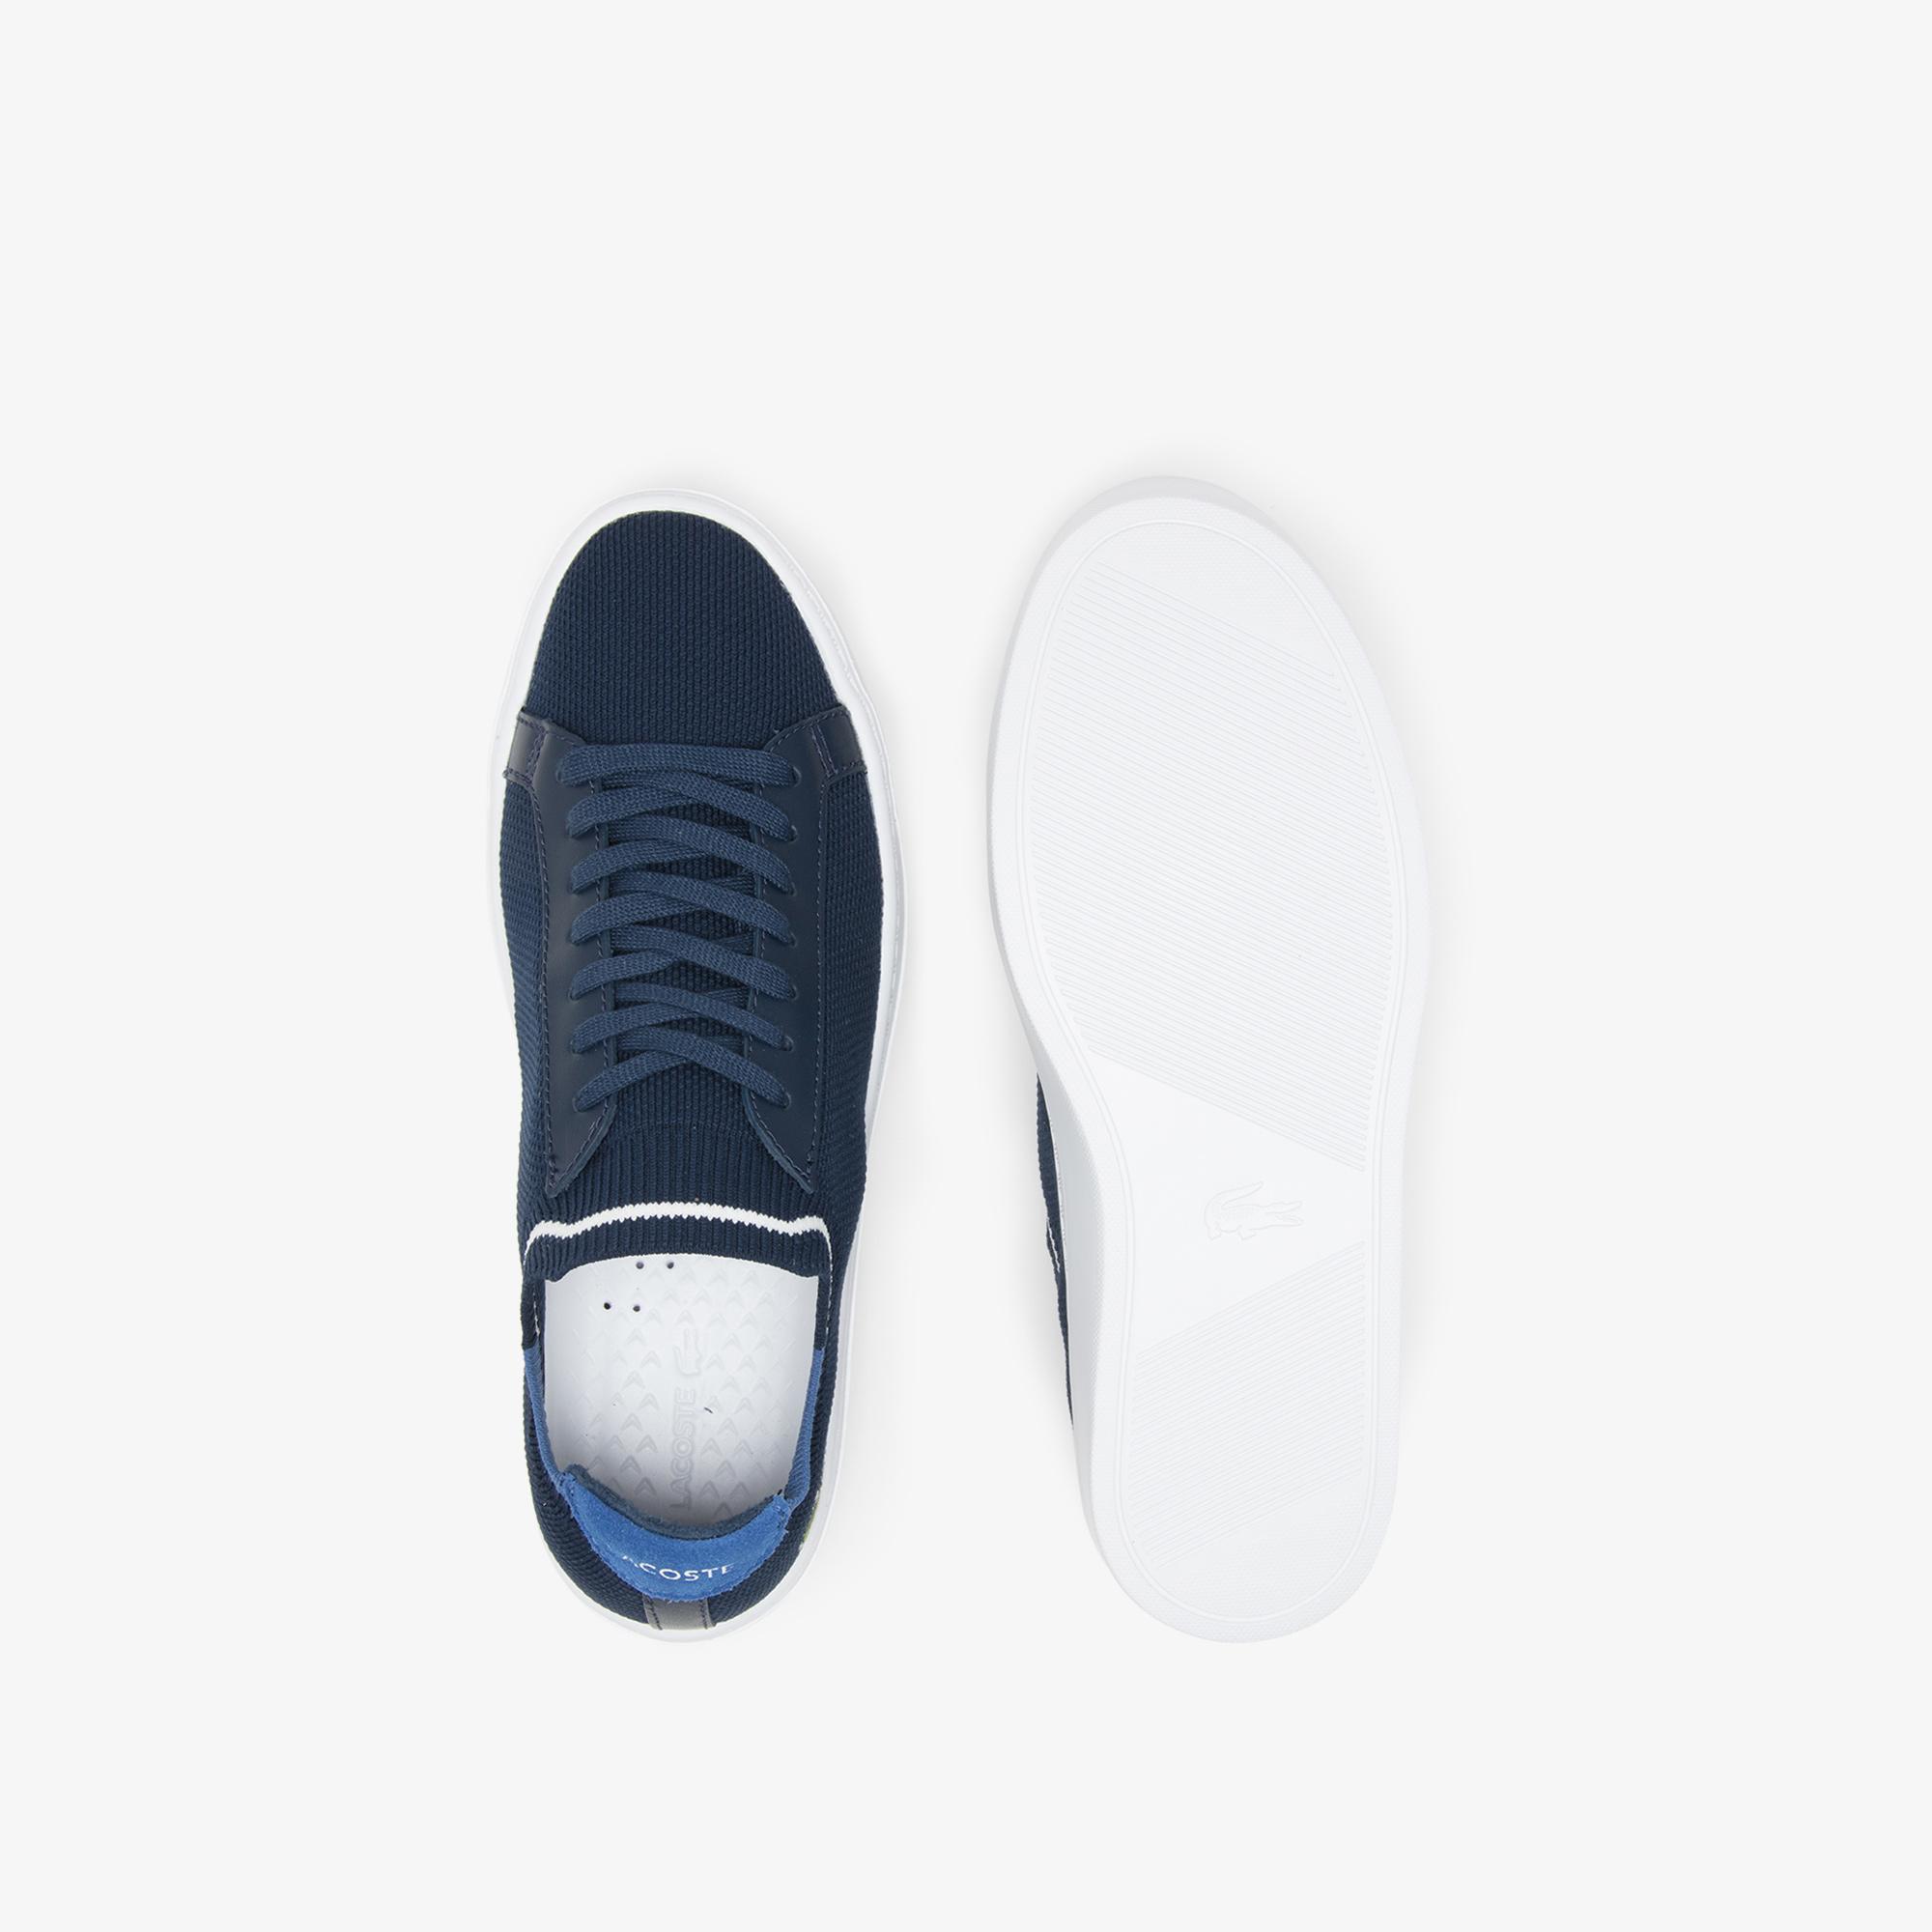 Lacoste La Piquee 120 1 Cma Erkek Lacivert Ayakkabı